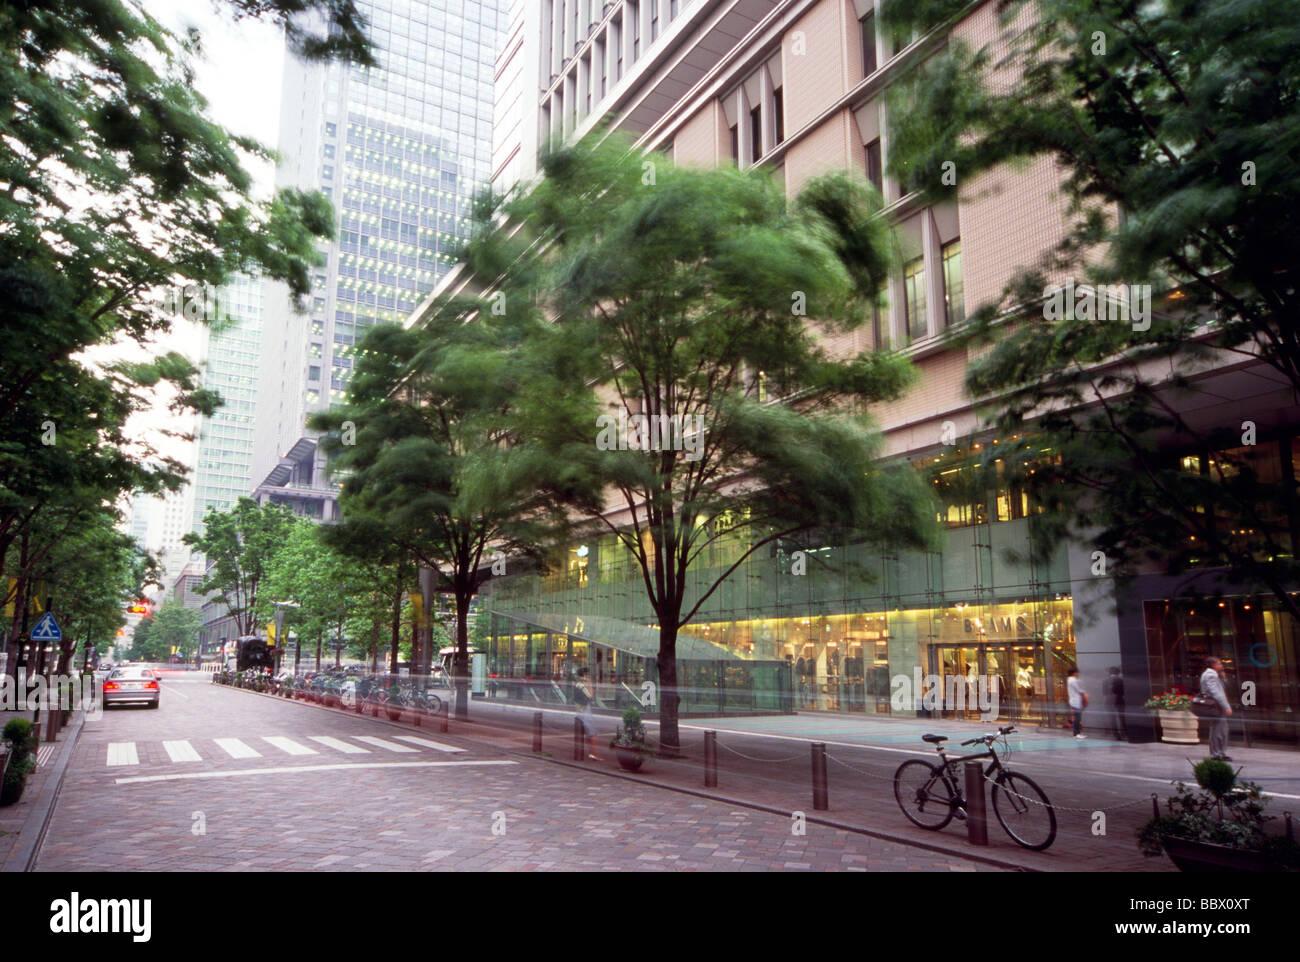 Cityscape of Marunouchi, Tokyo, Japan Stock Photo